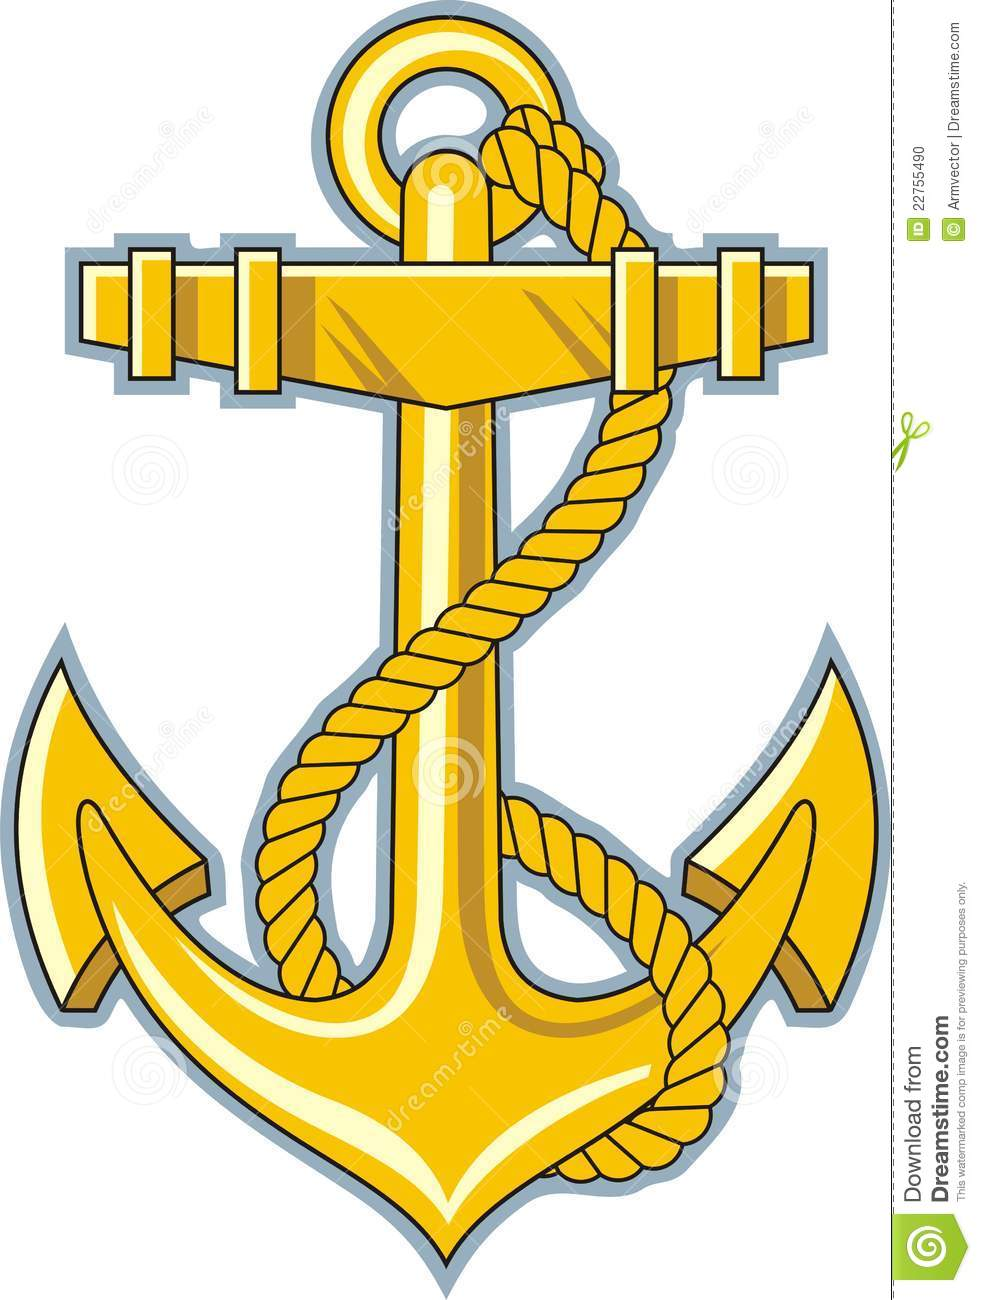 1957 Anchor free clipart.